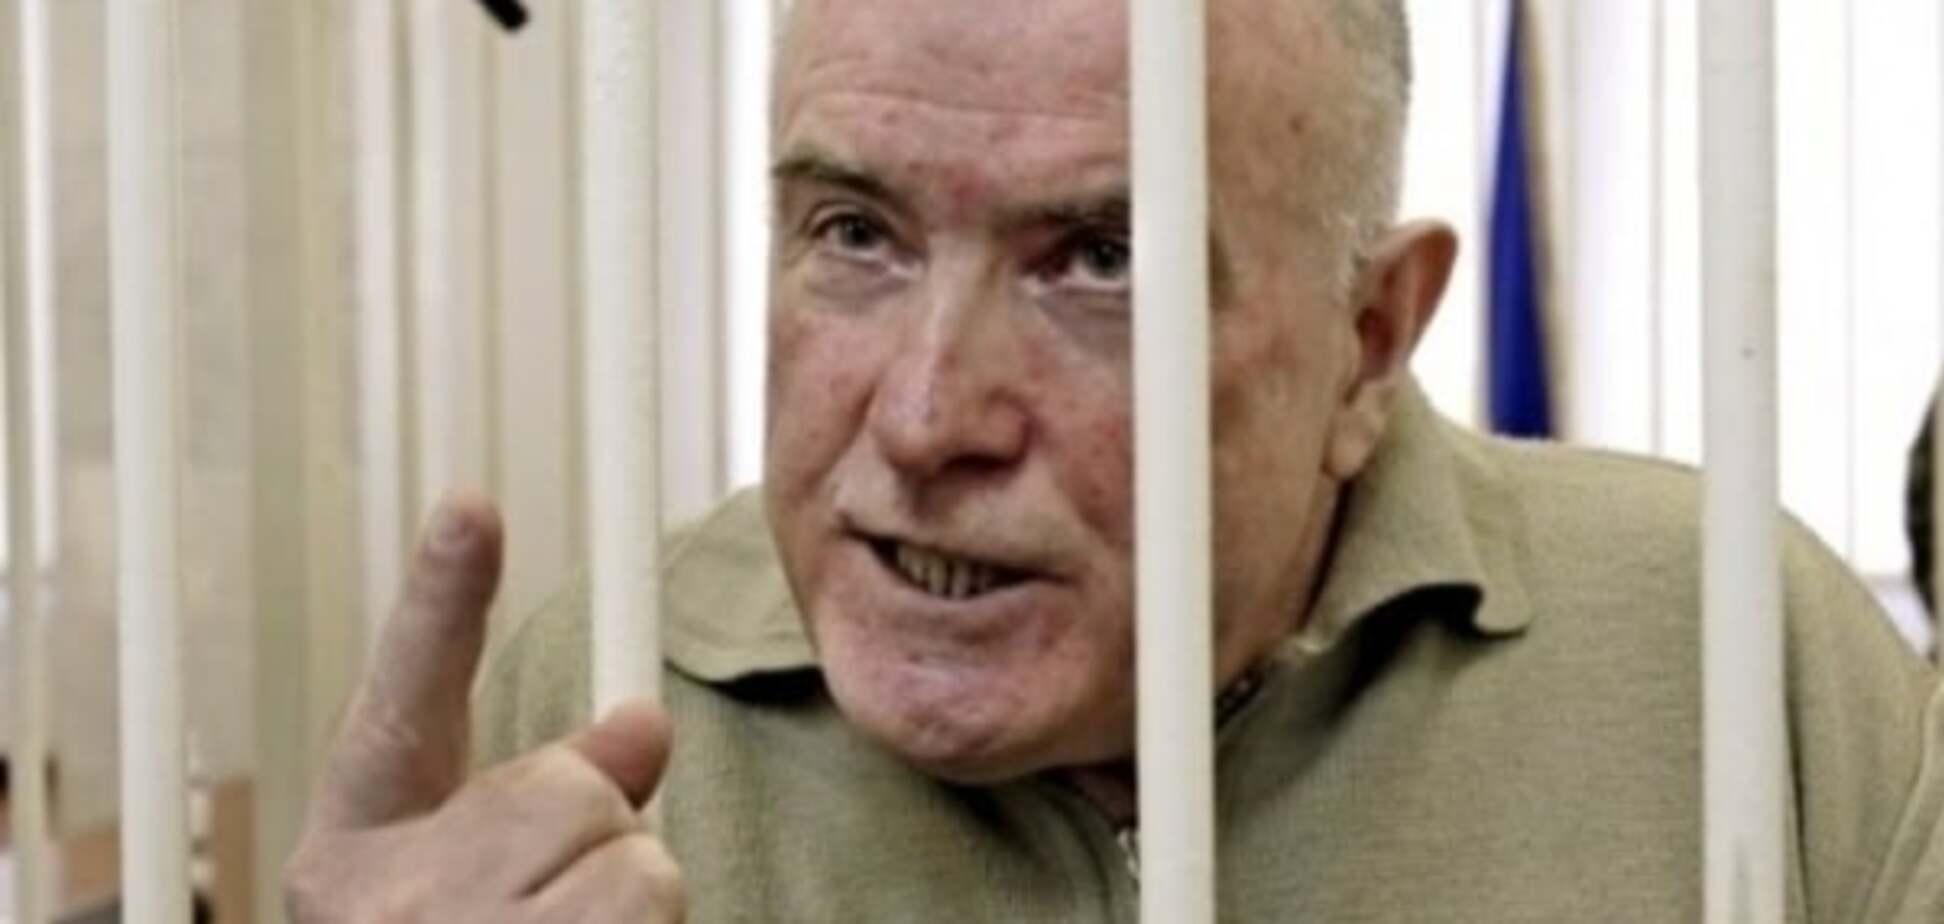 Дело Пукача: суд взялся за жалобу по приговору убийце Гонгадзе